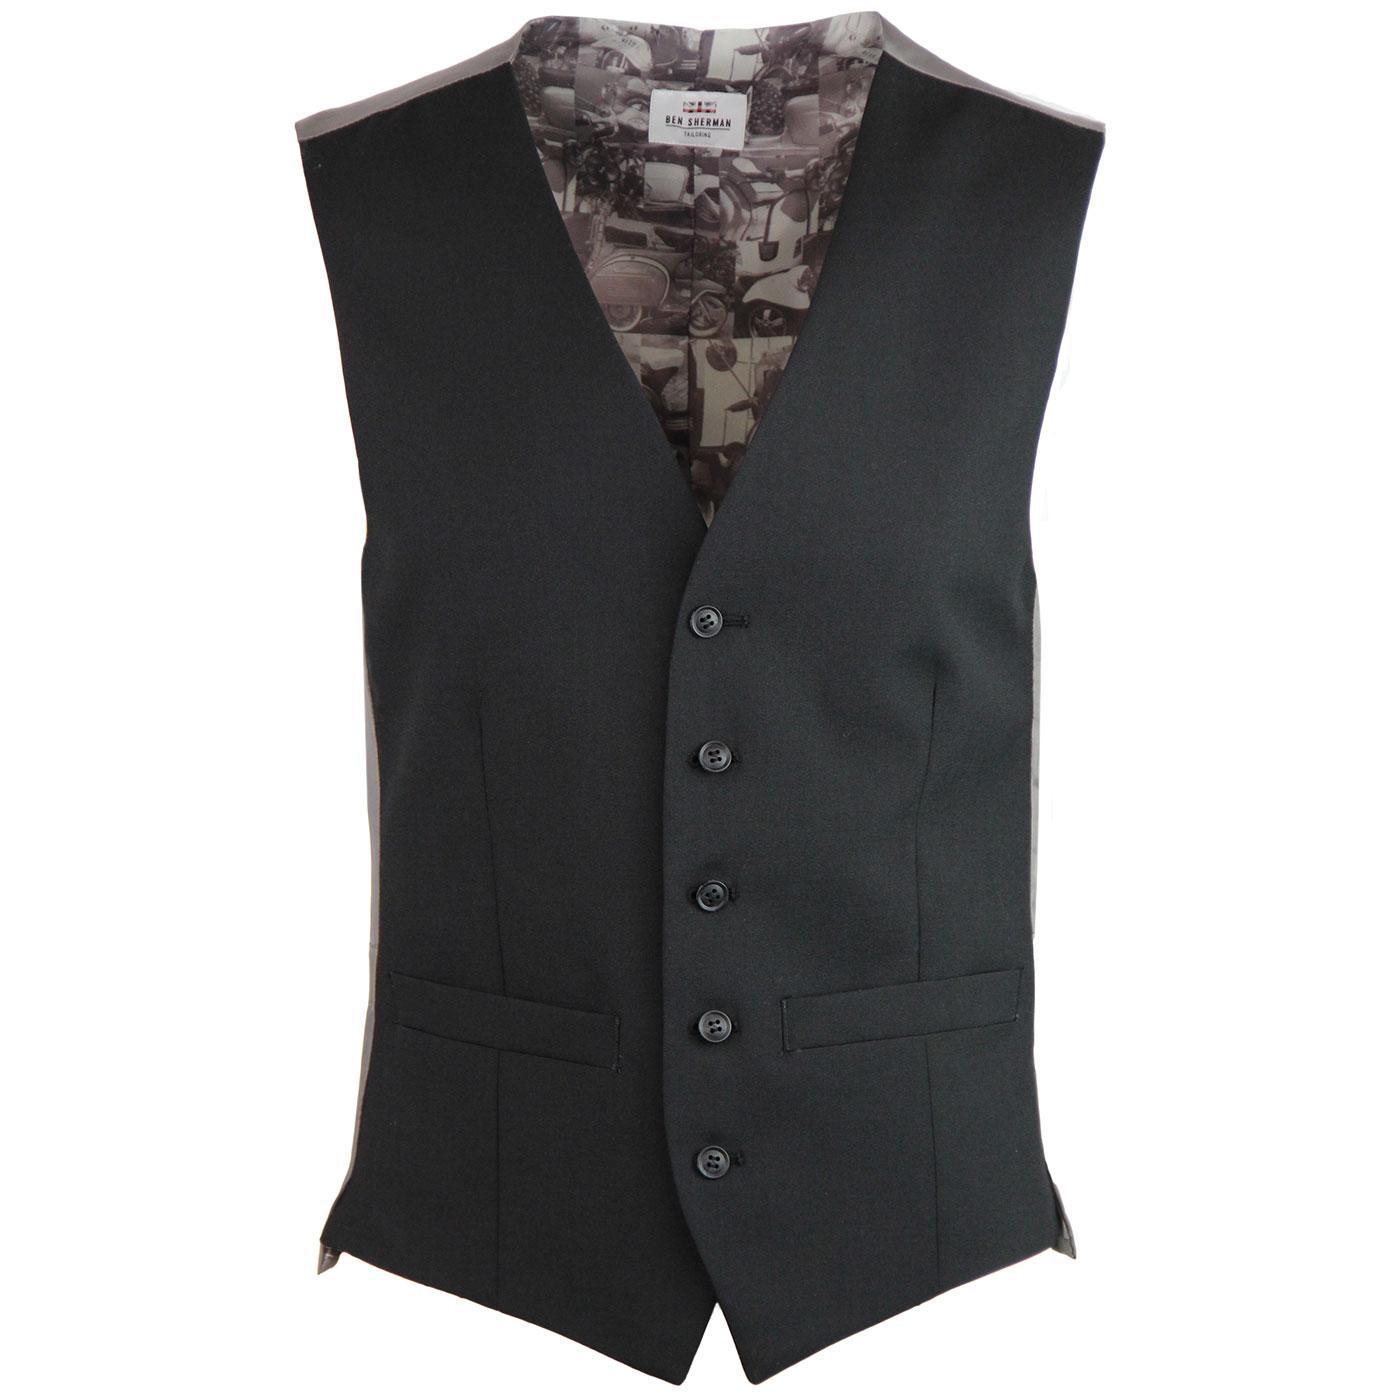 BEN SHERMAN Tailoring Mod Tonic Waistcoat (Black)